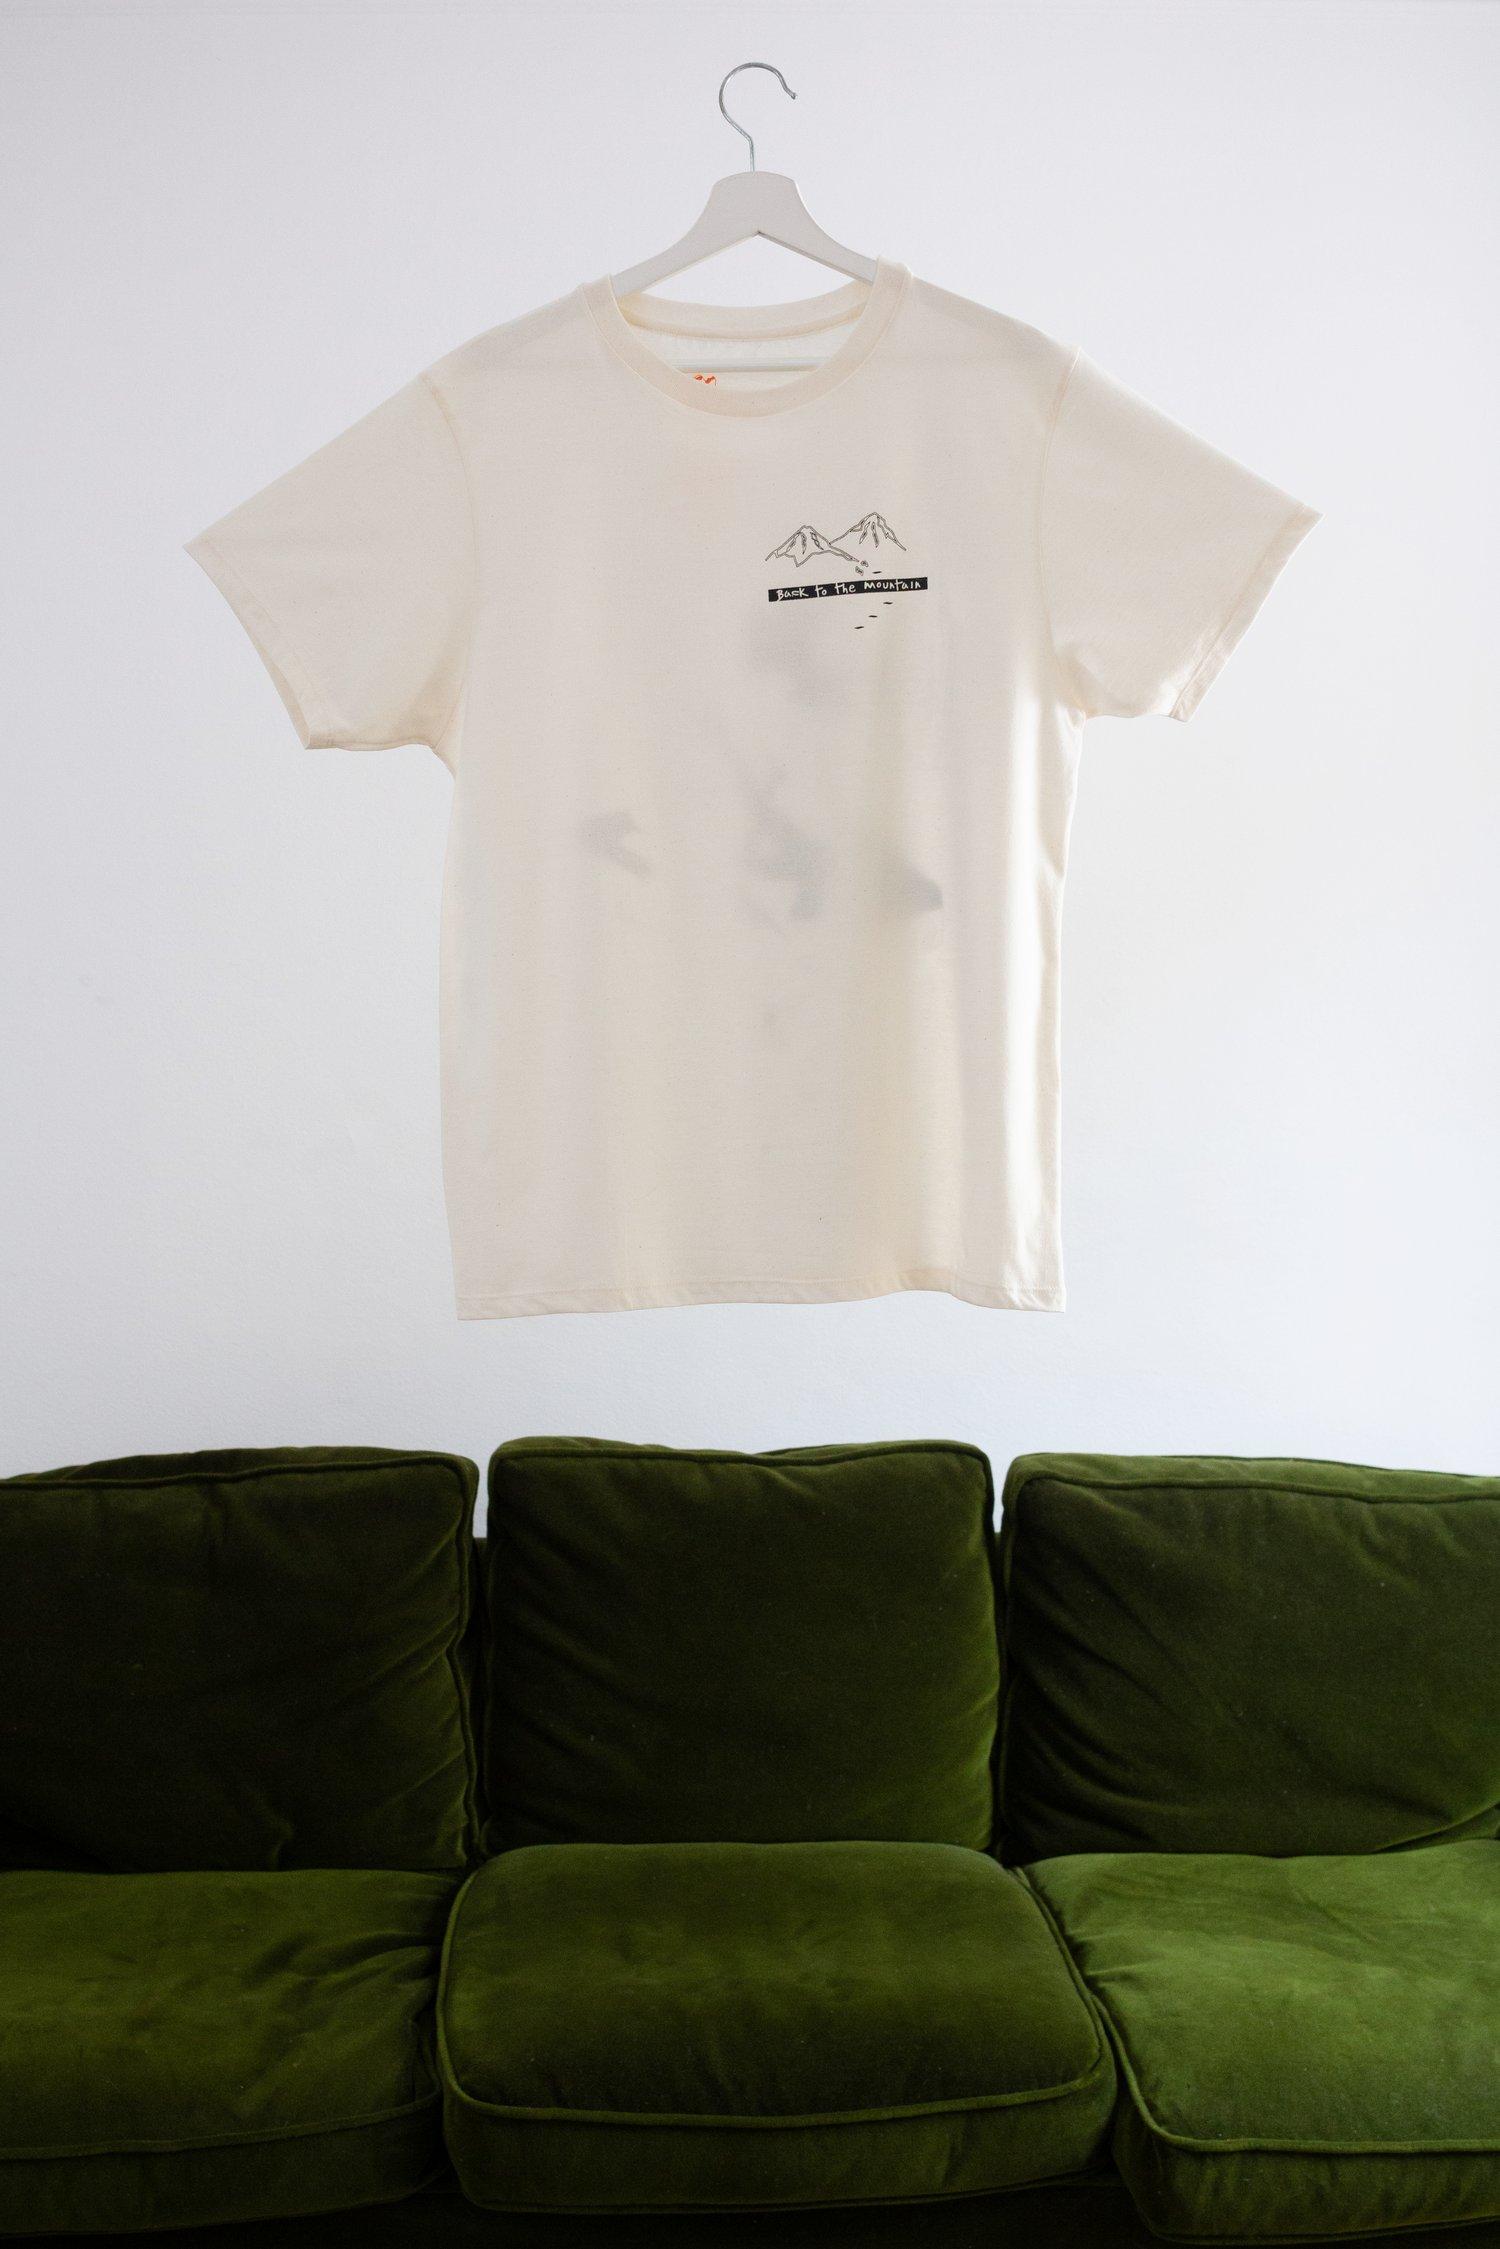 Image of  'Mount' t-shirt